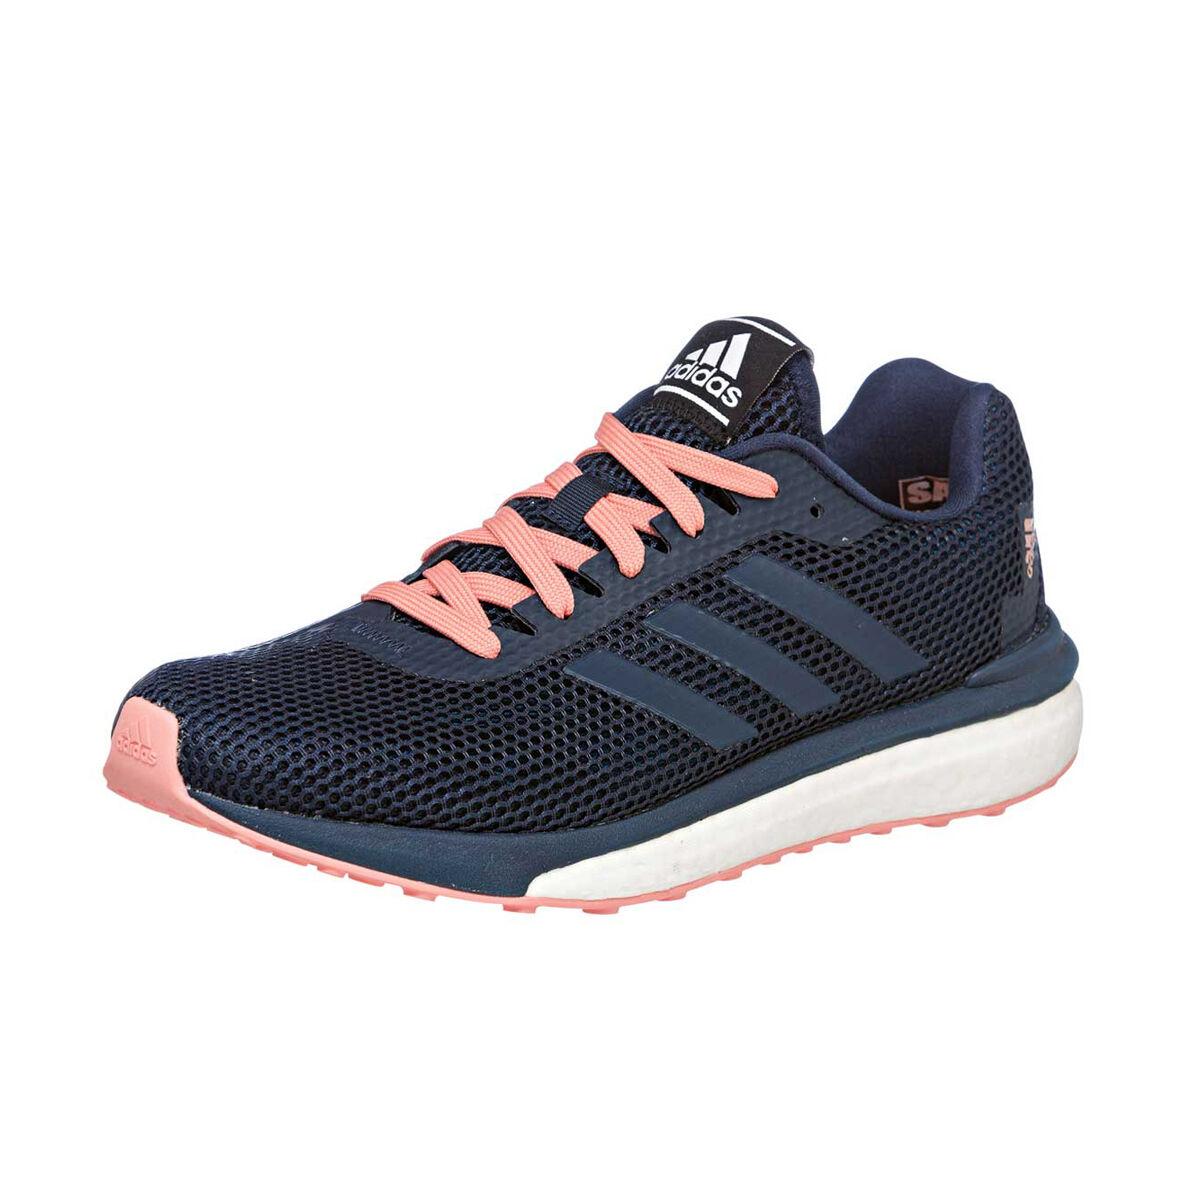 Adidas vendicativo donne scarpe blu / marina noi rebel sport